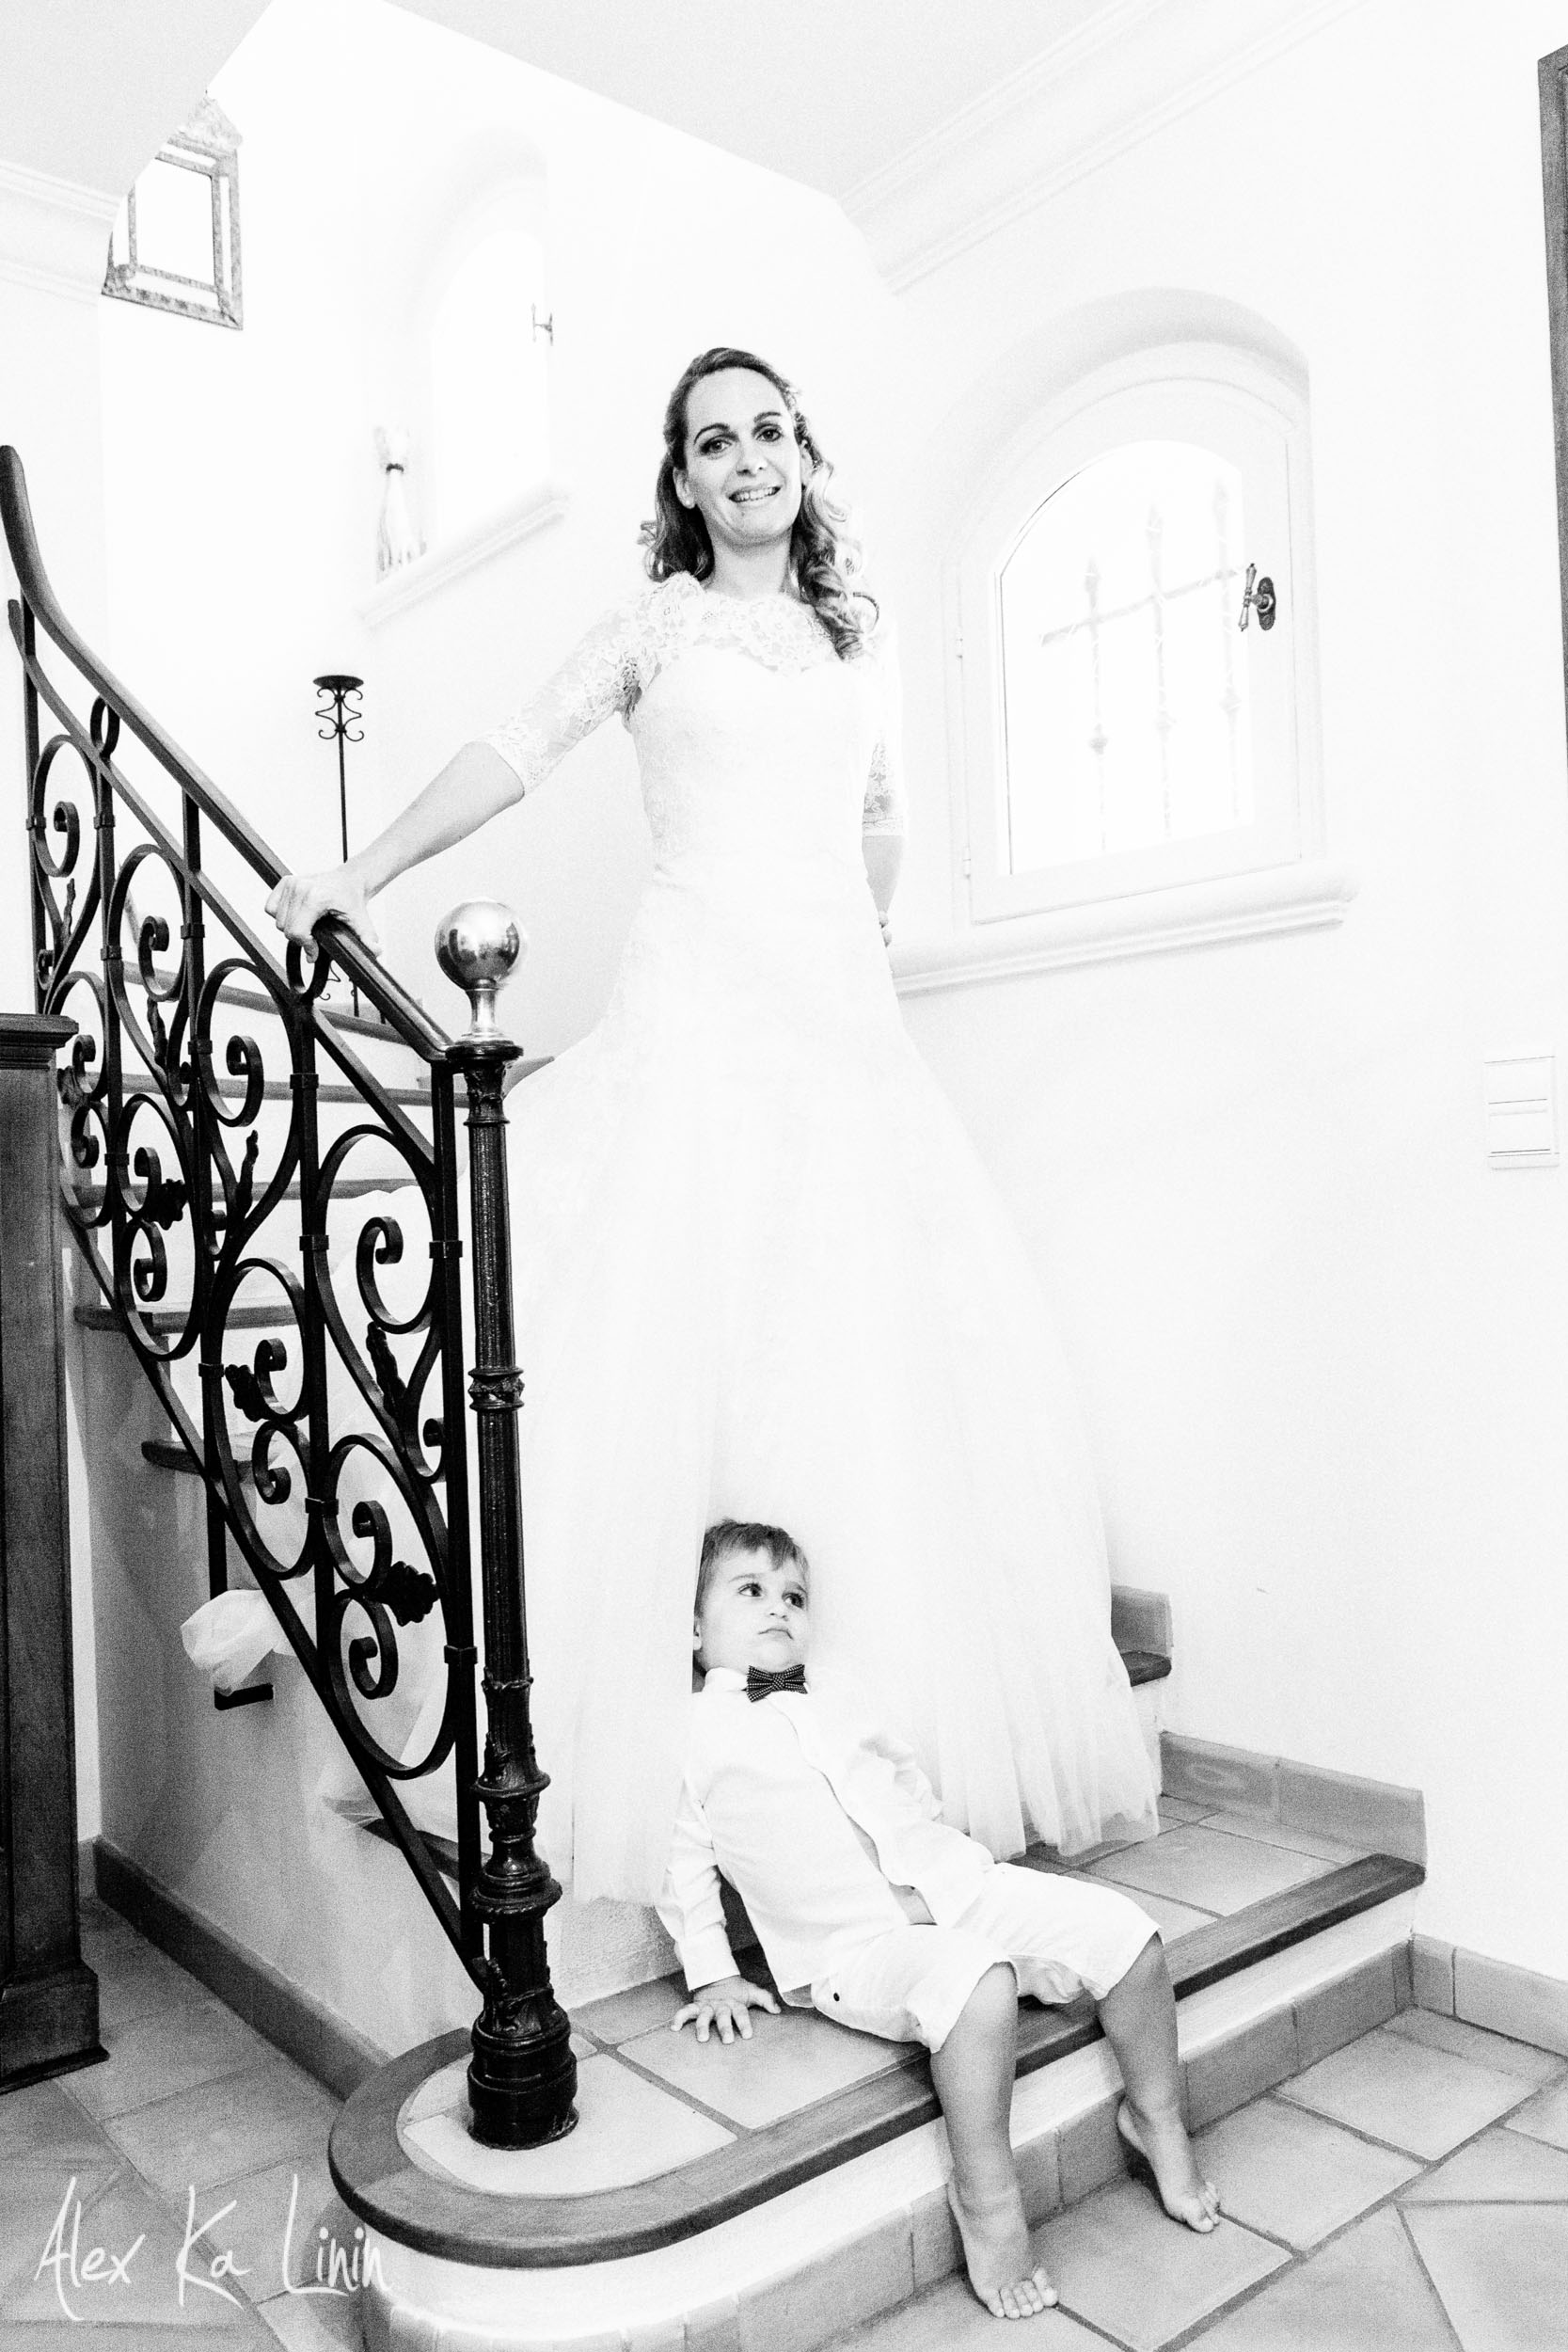 AlexKa_wedding_mariage_photographer-7.jpg